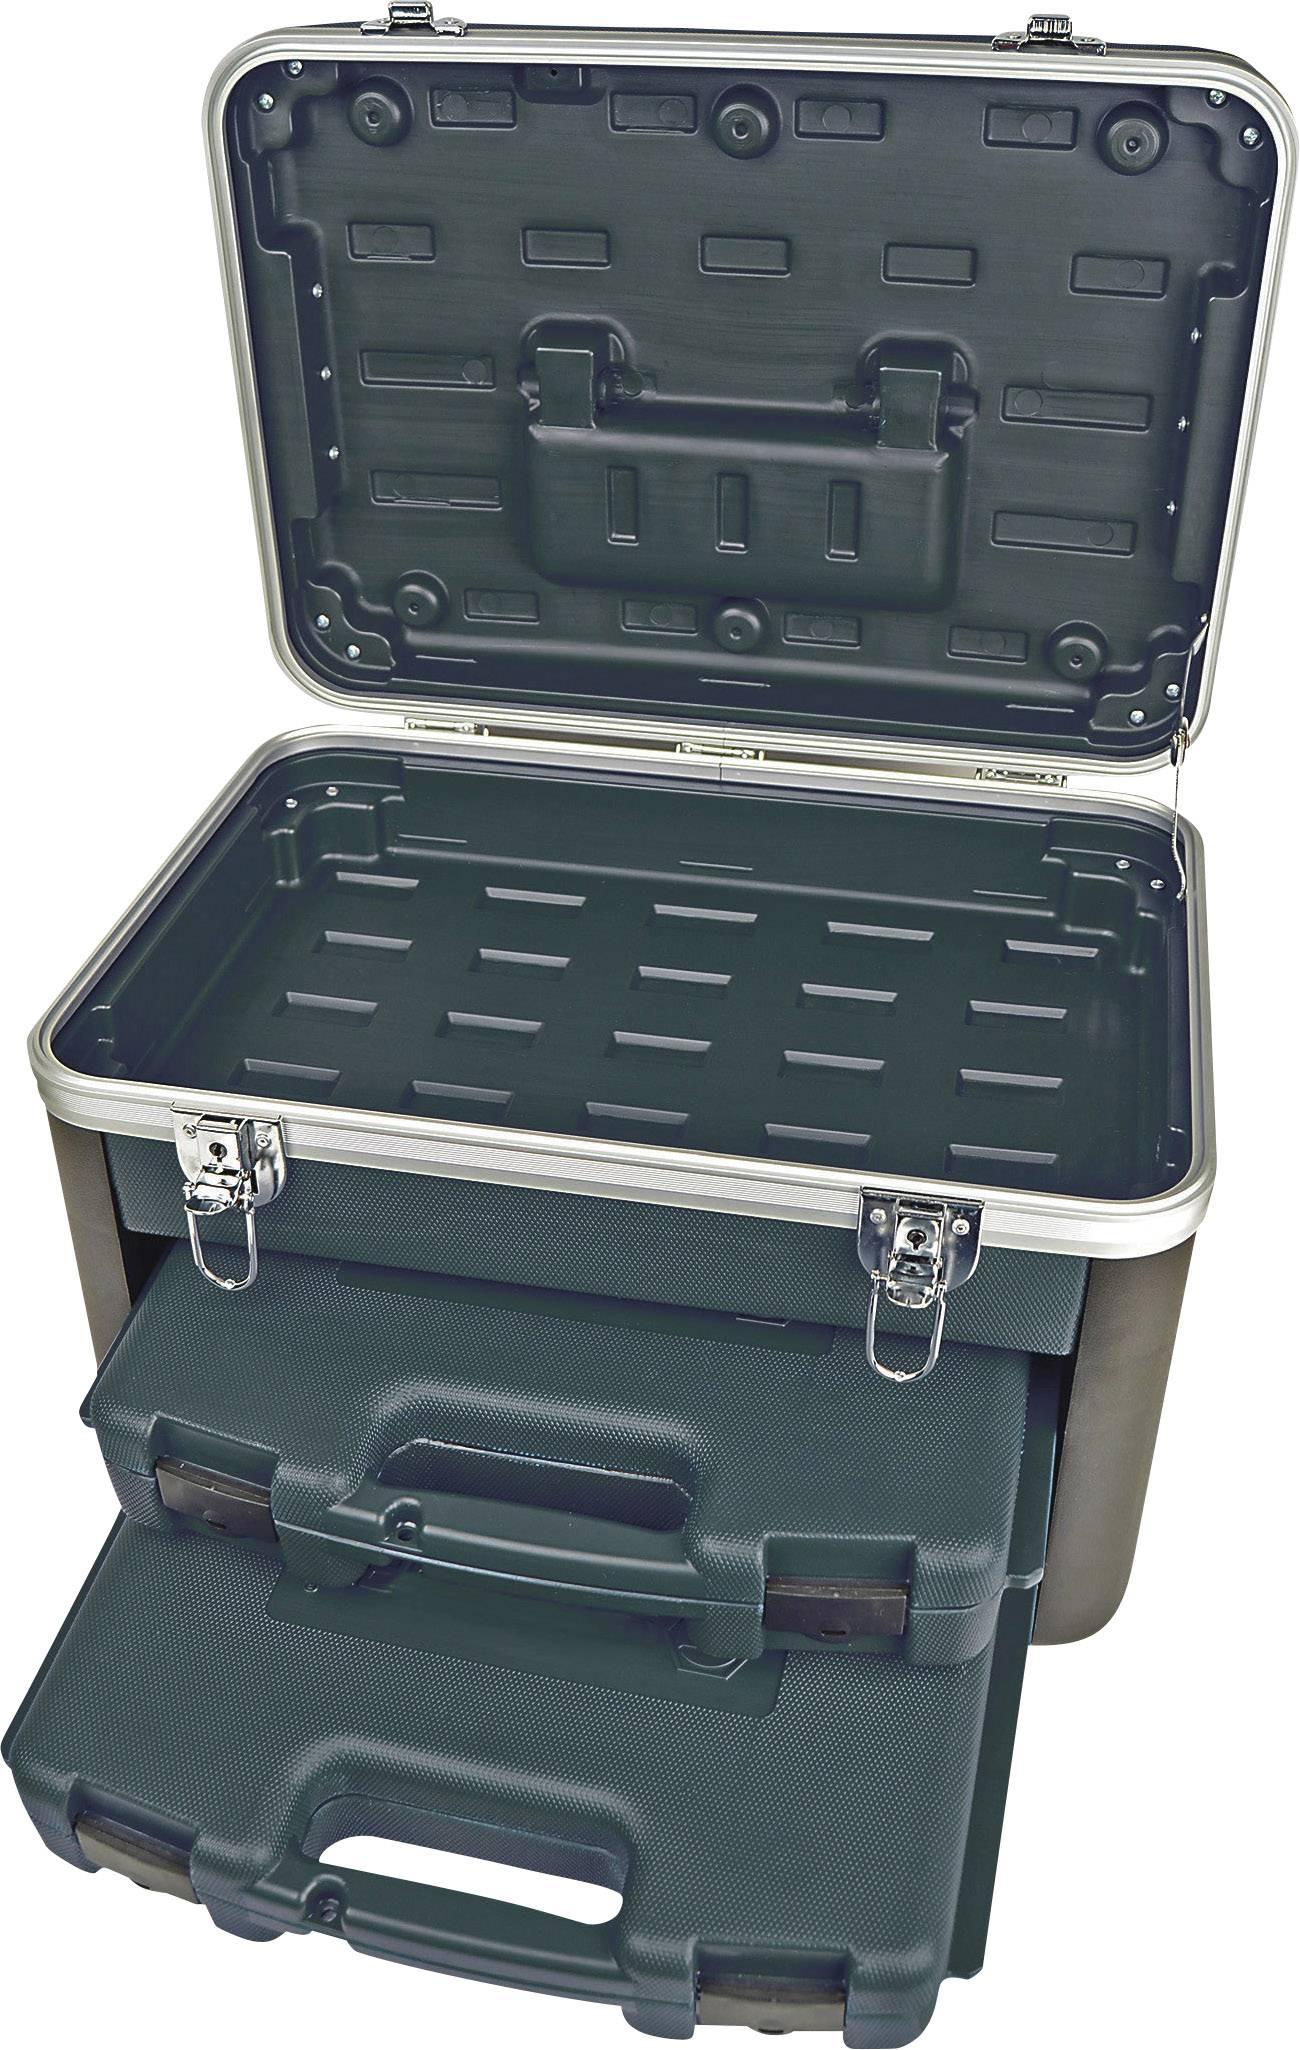 Kufřík s nářadím Brüder Mannesmann M29087, (d x š x v) 485 x 360 x 310 mm